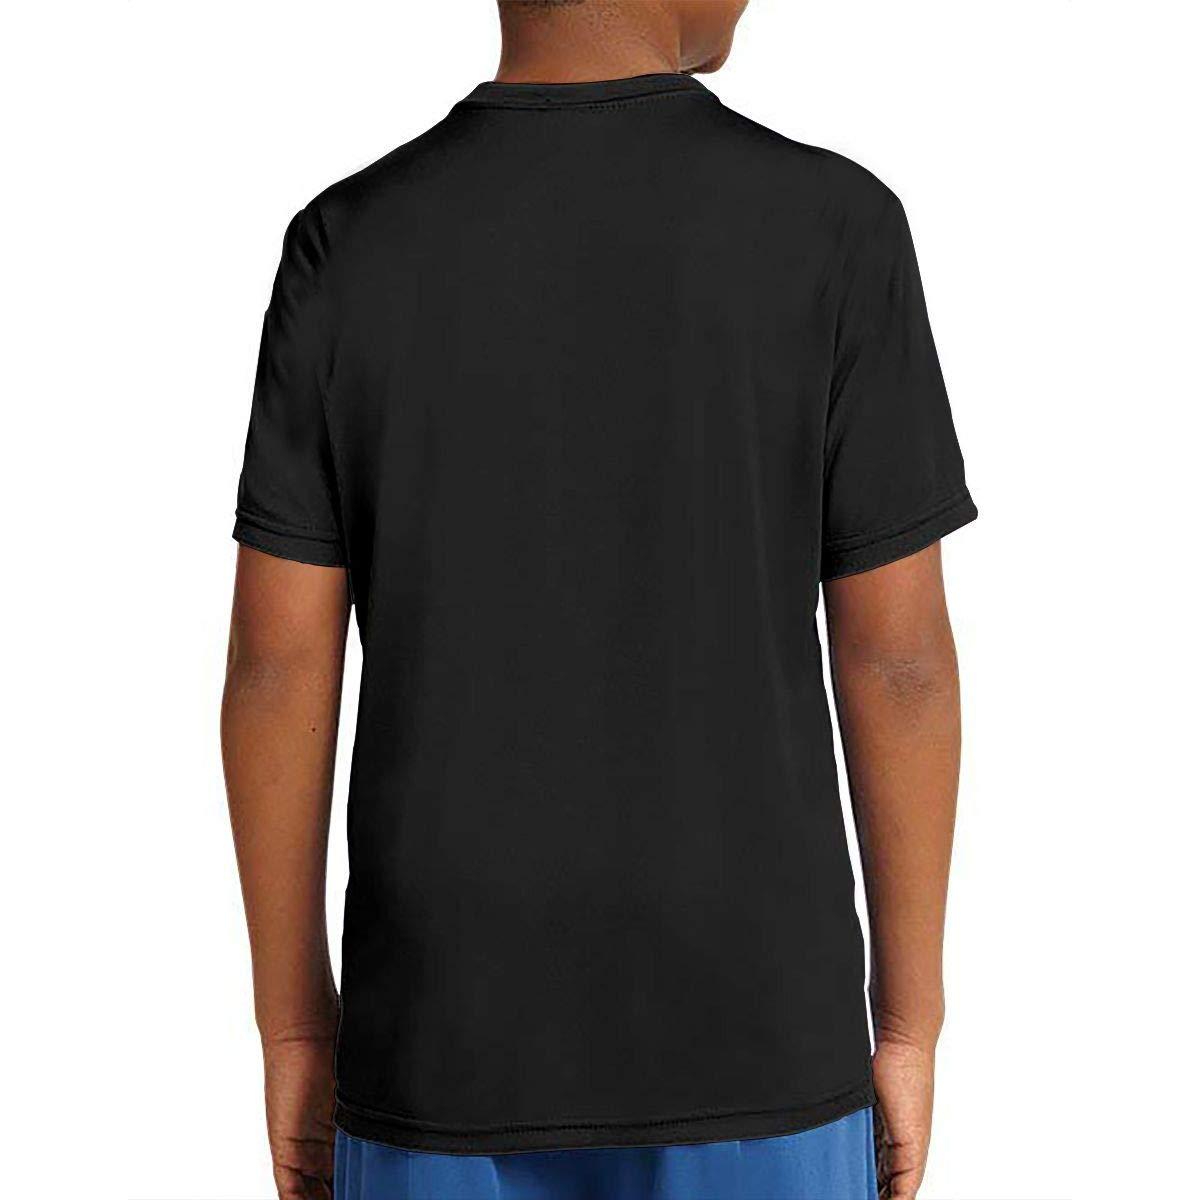 WALAWALA Chad-Wild-Clay Fashion Polyester T Shirt for Youth